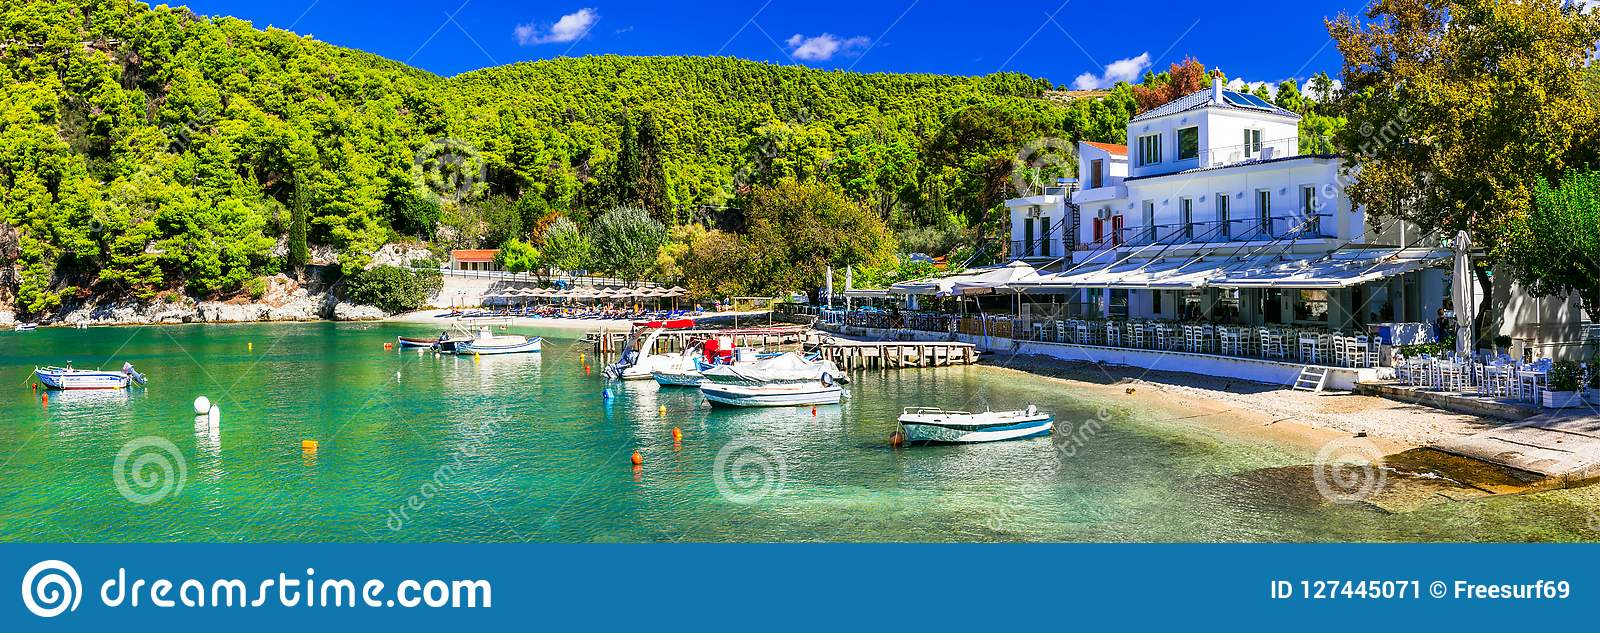 Picturesque fishing village Agnontas ,Skopelos island,Greece.